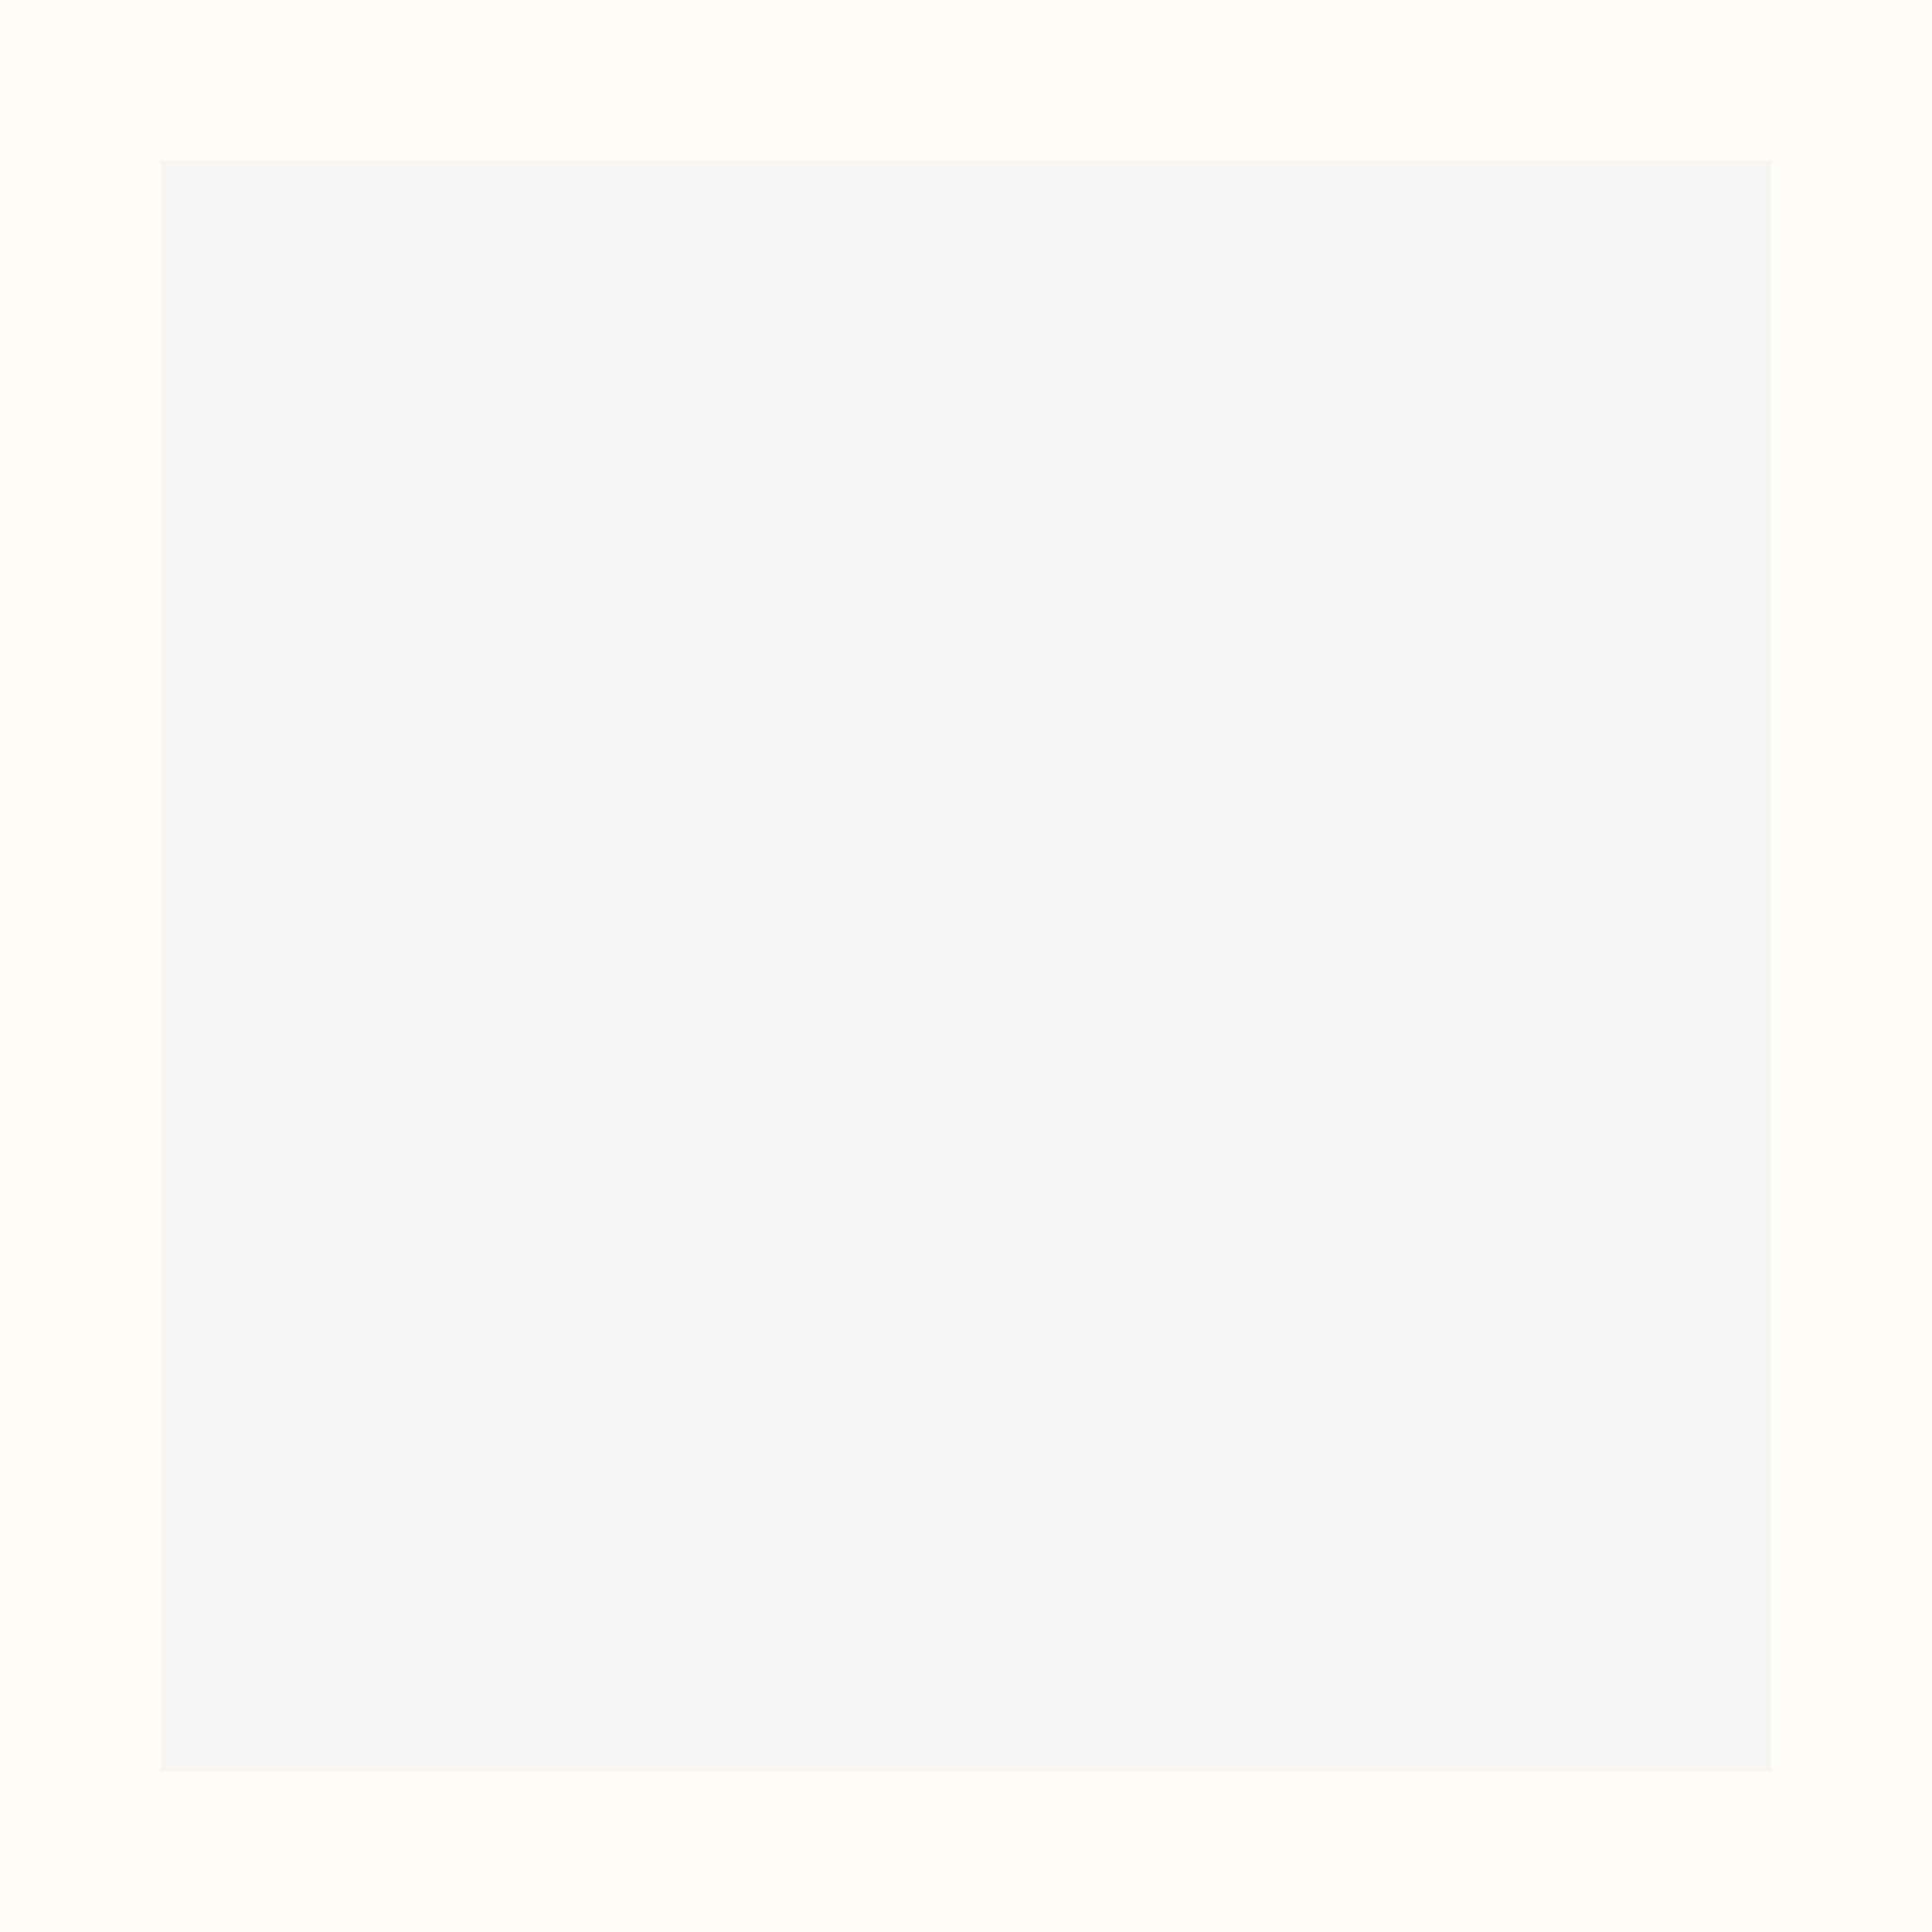 Parfum Hermes Nouveau Nouveau Nouveau Hermes Hermes Parfum Parfum Hermes Parfum Nouveau HIYD2W9E